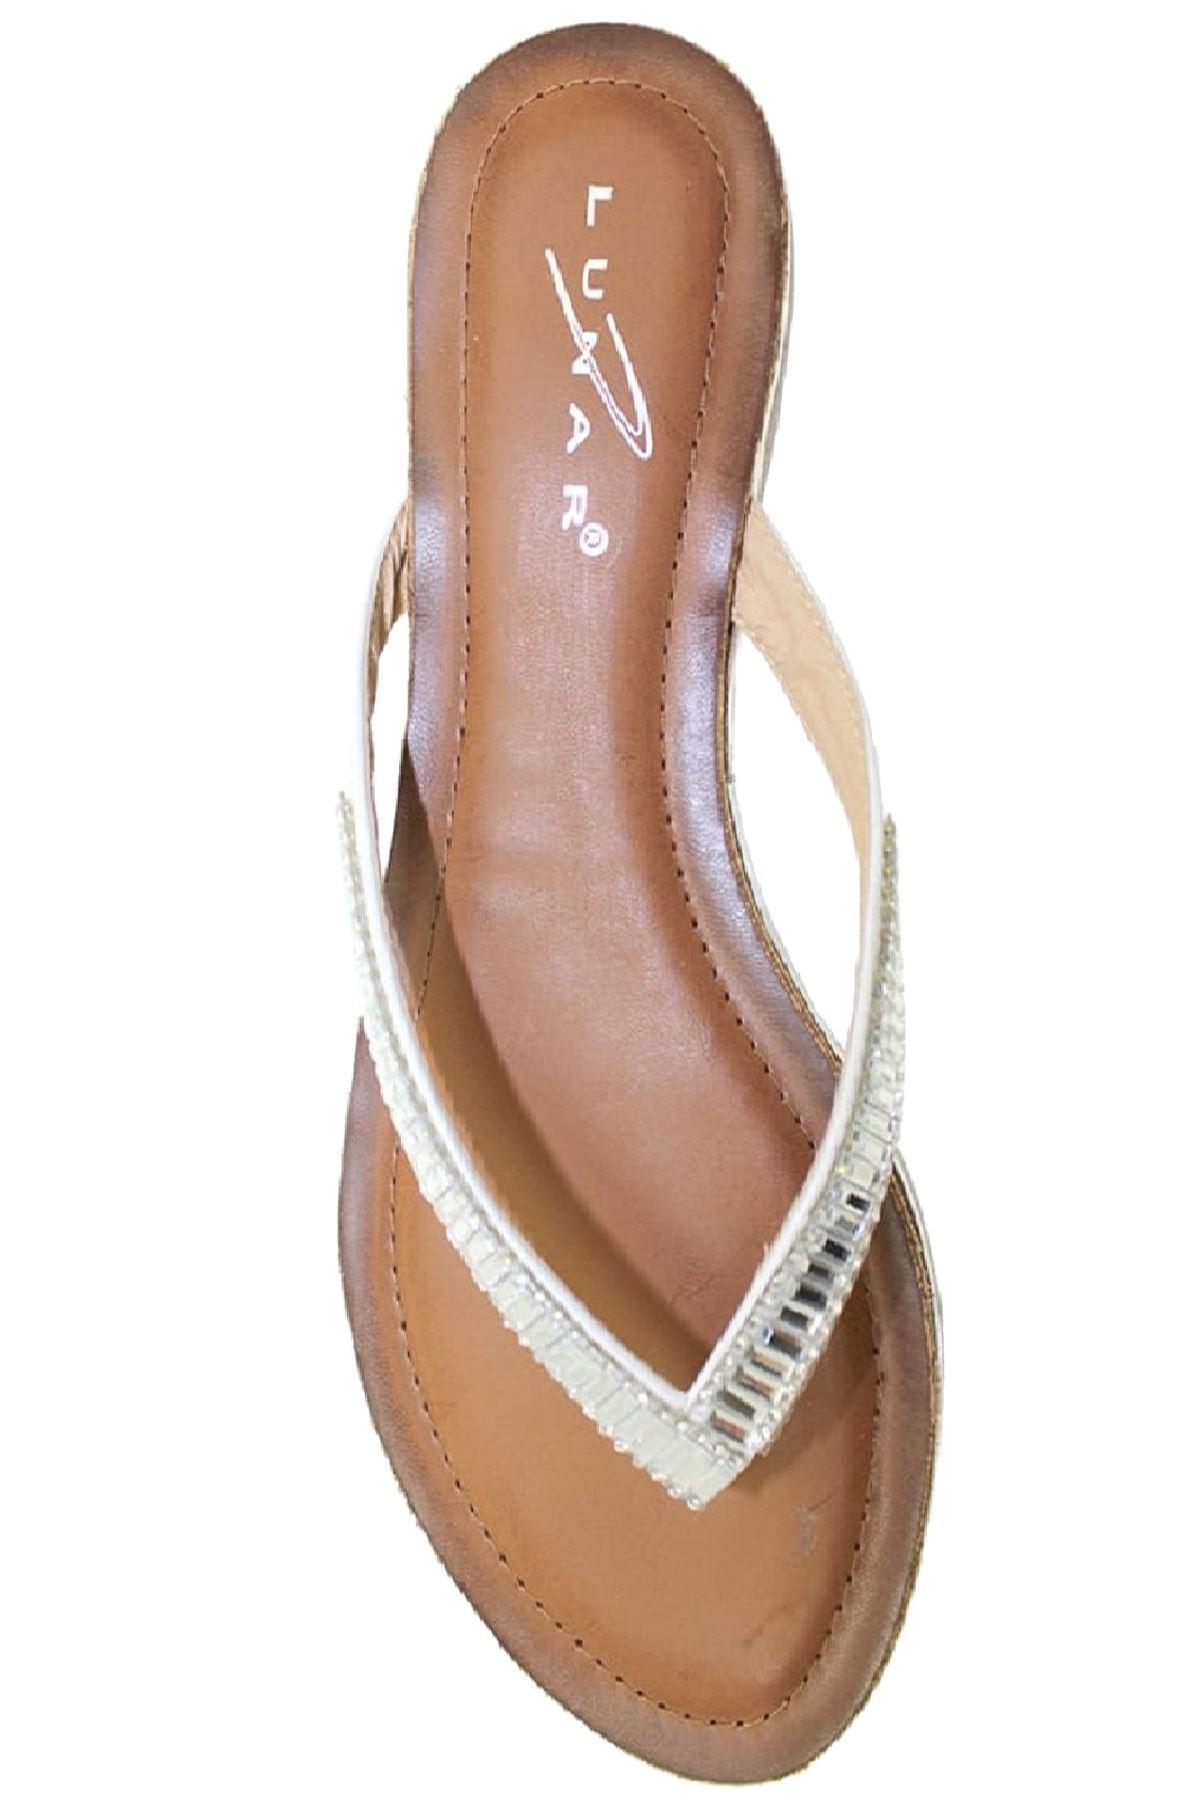 JLH812 Starla Ladies Diamante Comfortable Toe Post Fashion Flat Thong Sandals